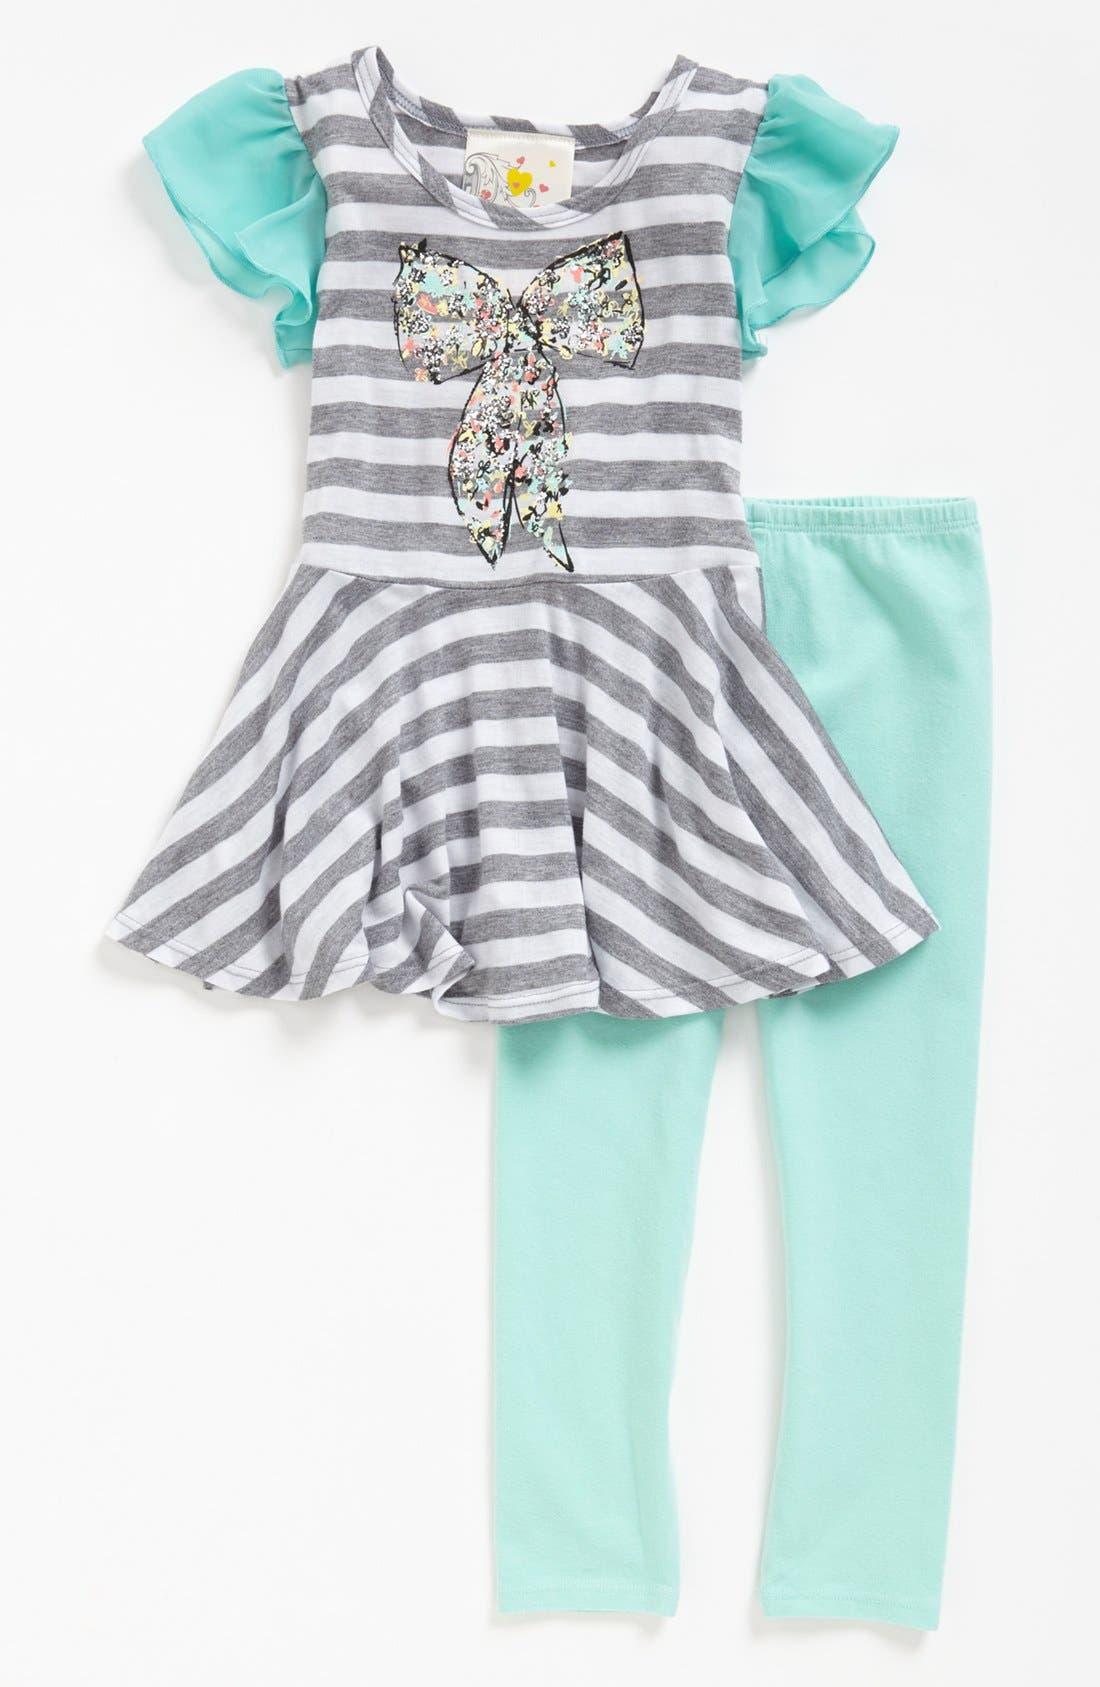 Main Image - Jenna & Jessie 'Bow' Dress & Leggings (Toddler Girls)